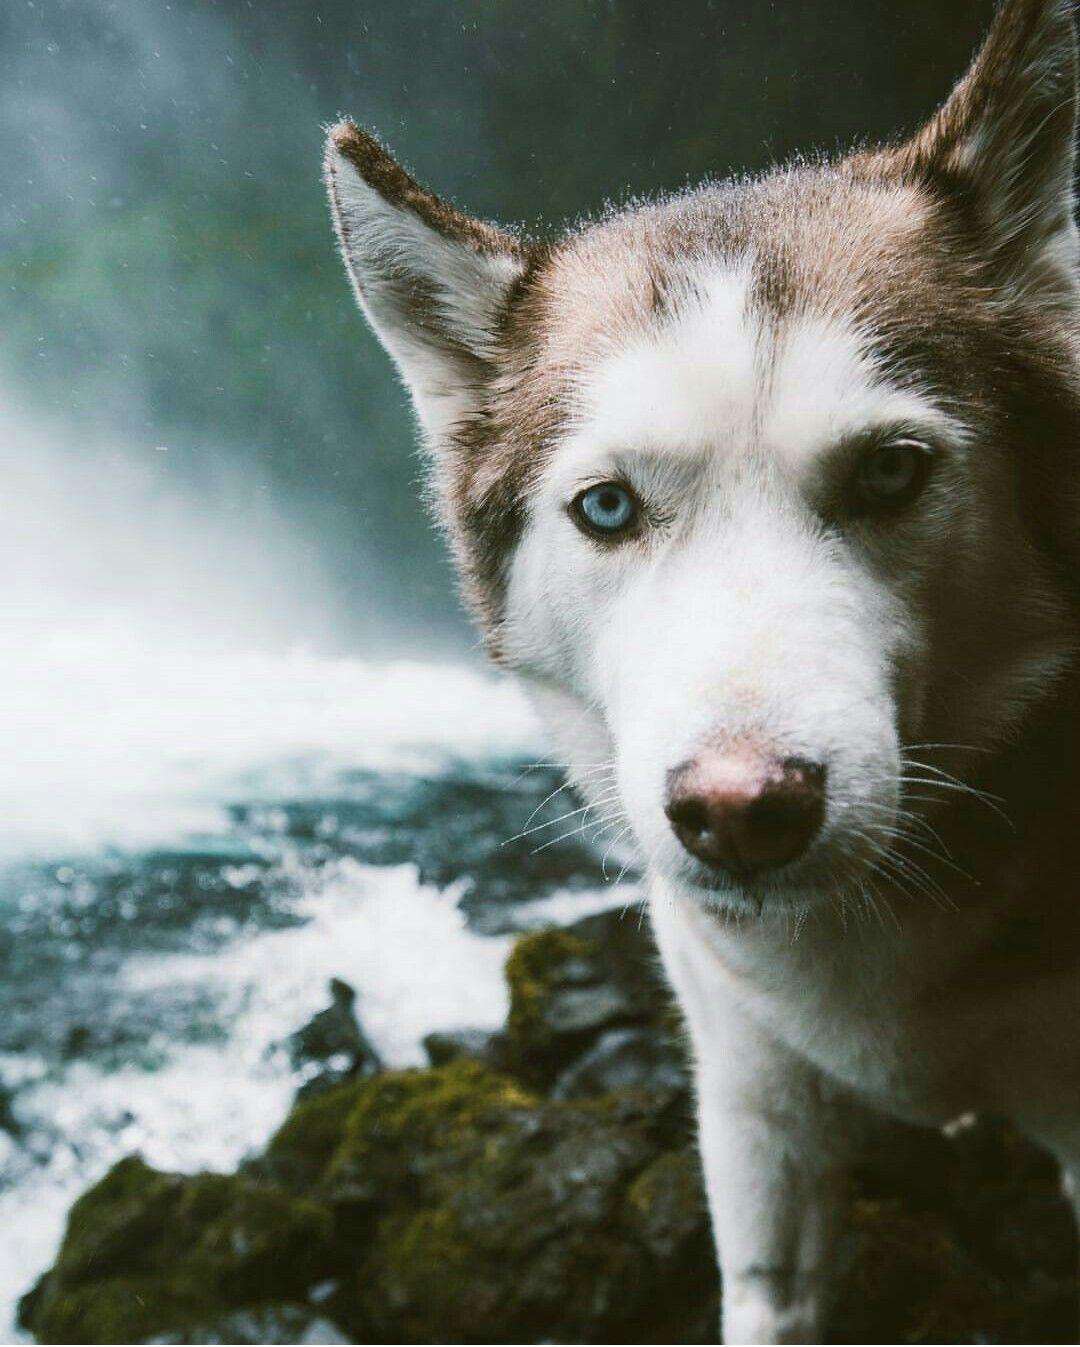 Pin By Makaila On Huskies Pinterest Husky Dogs And Pets